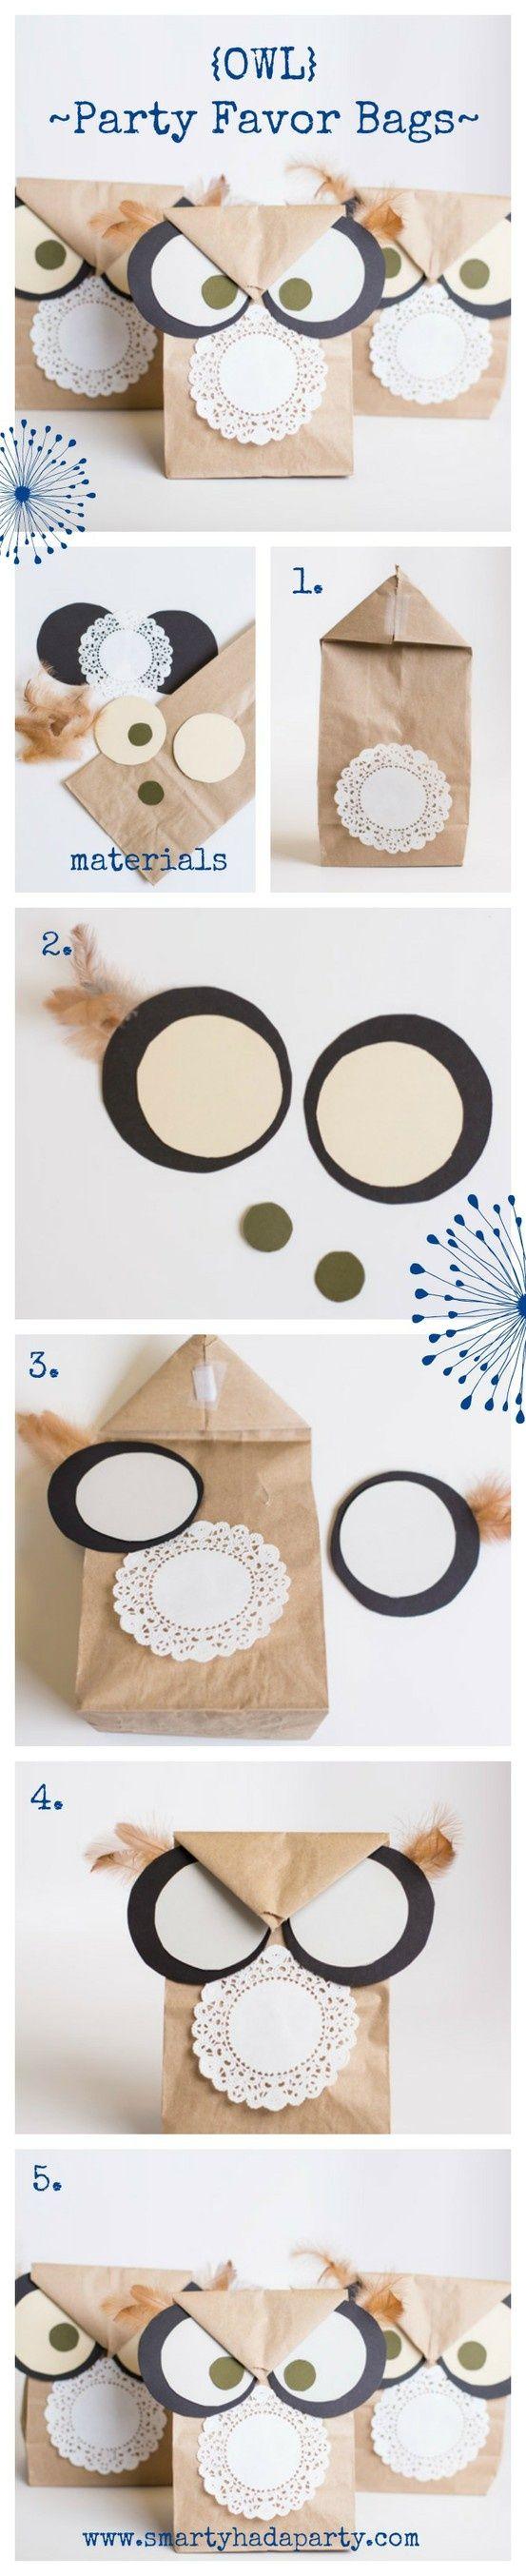 DIY Owl Party Favor Bags tutorial   SmartyHadAParty.com